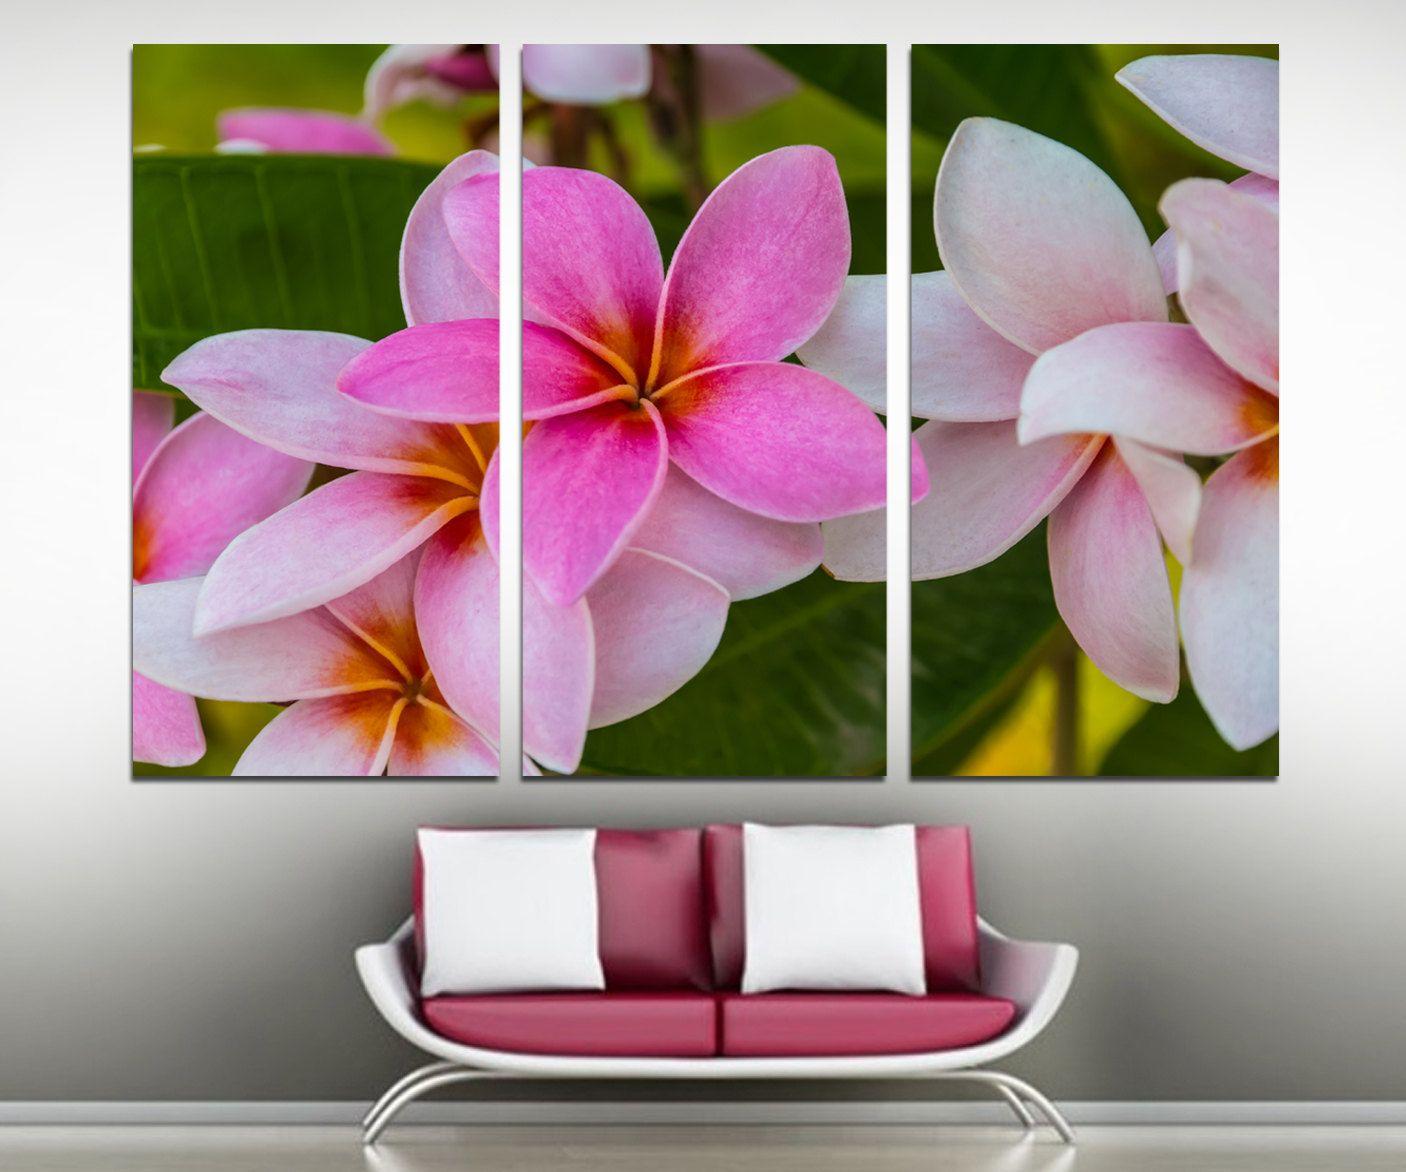 Pink Plumeria Flowers 3 Panel Split Triptych Canvas Print Etsy Triptych Canvas Plumeria Flowers Triptych Wall Art